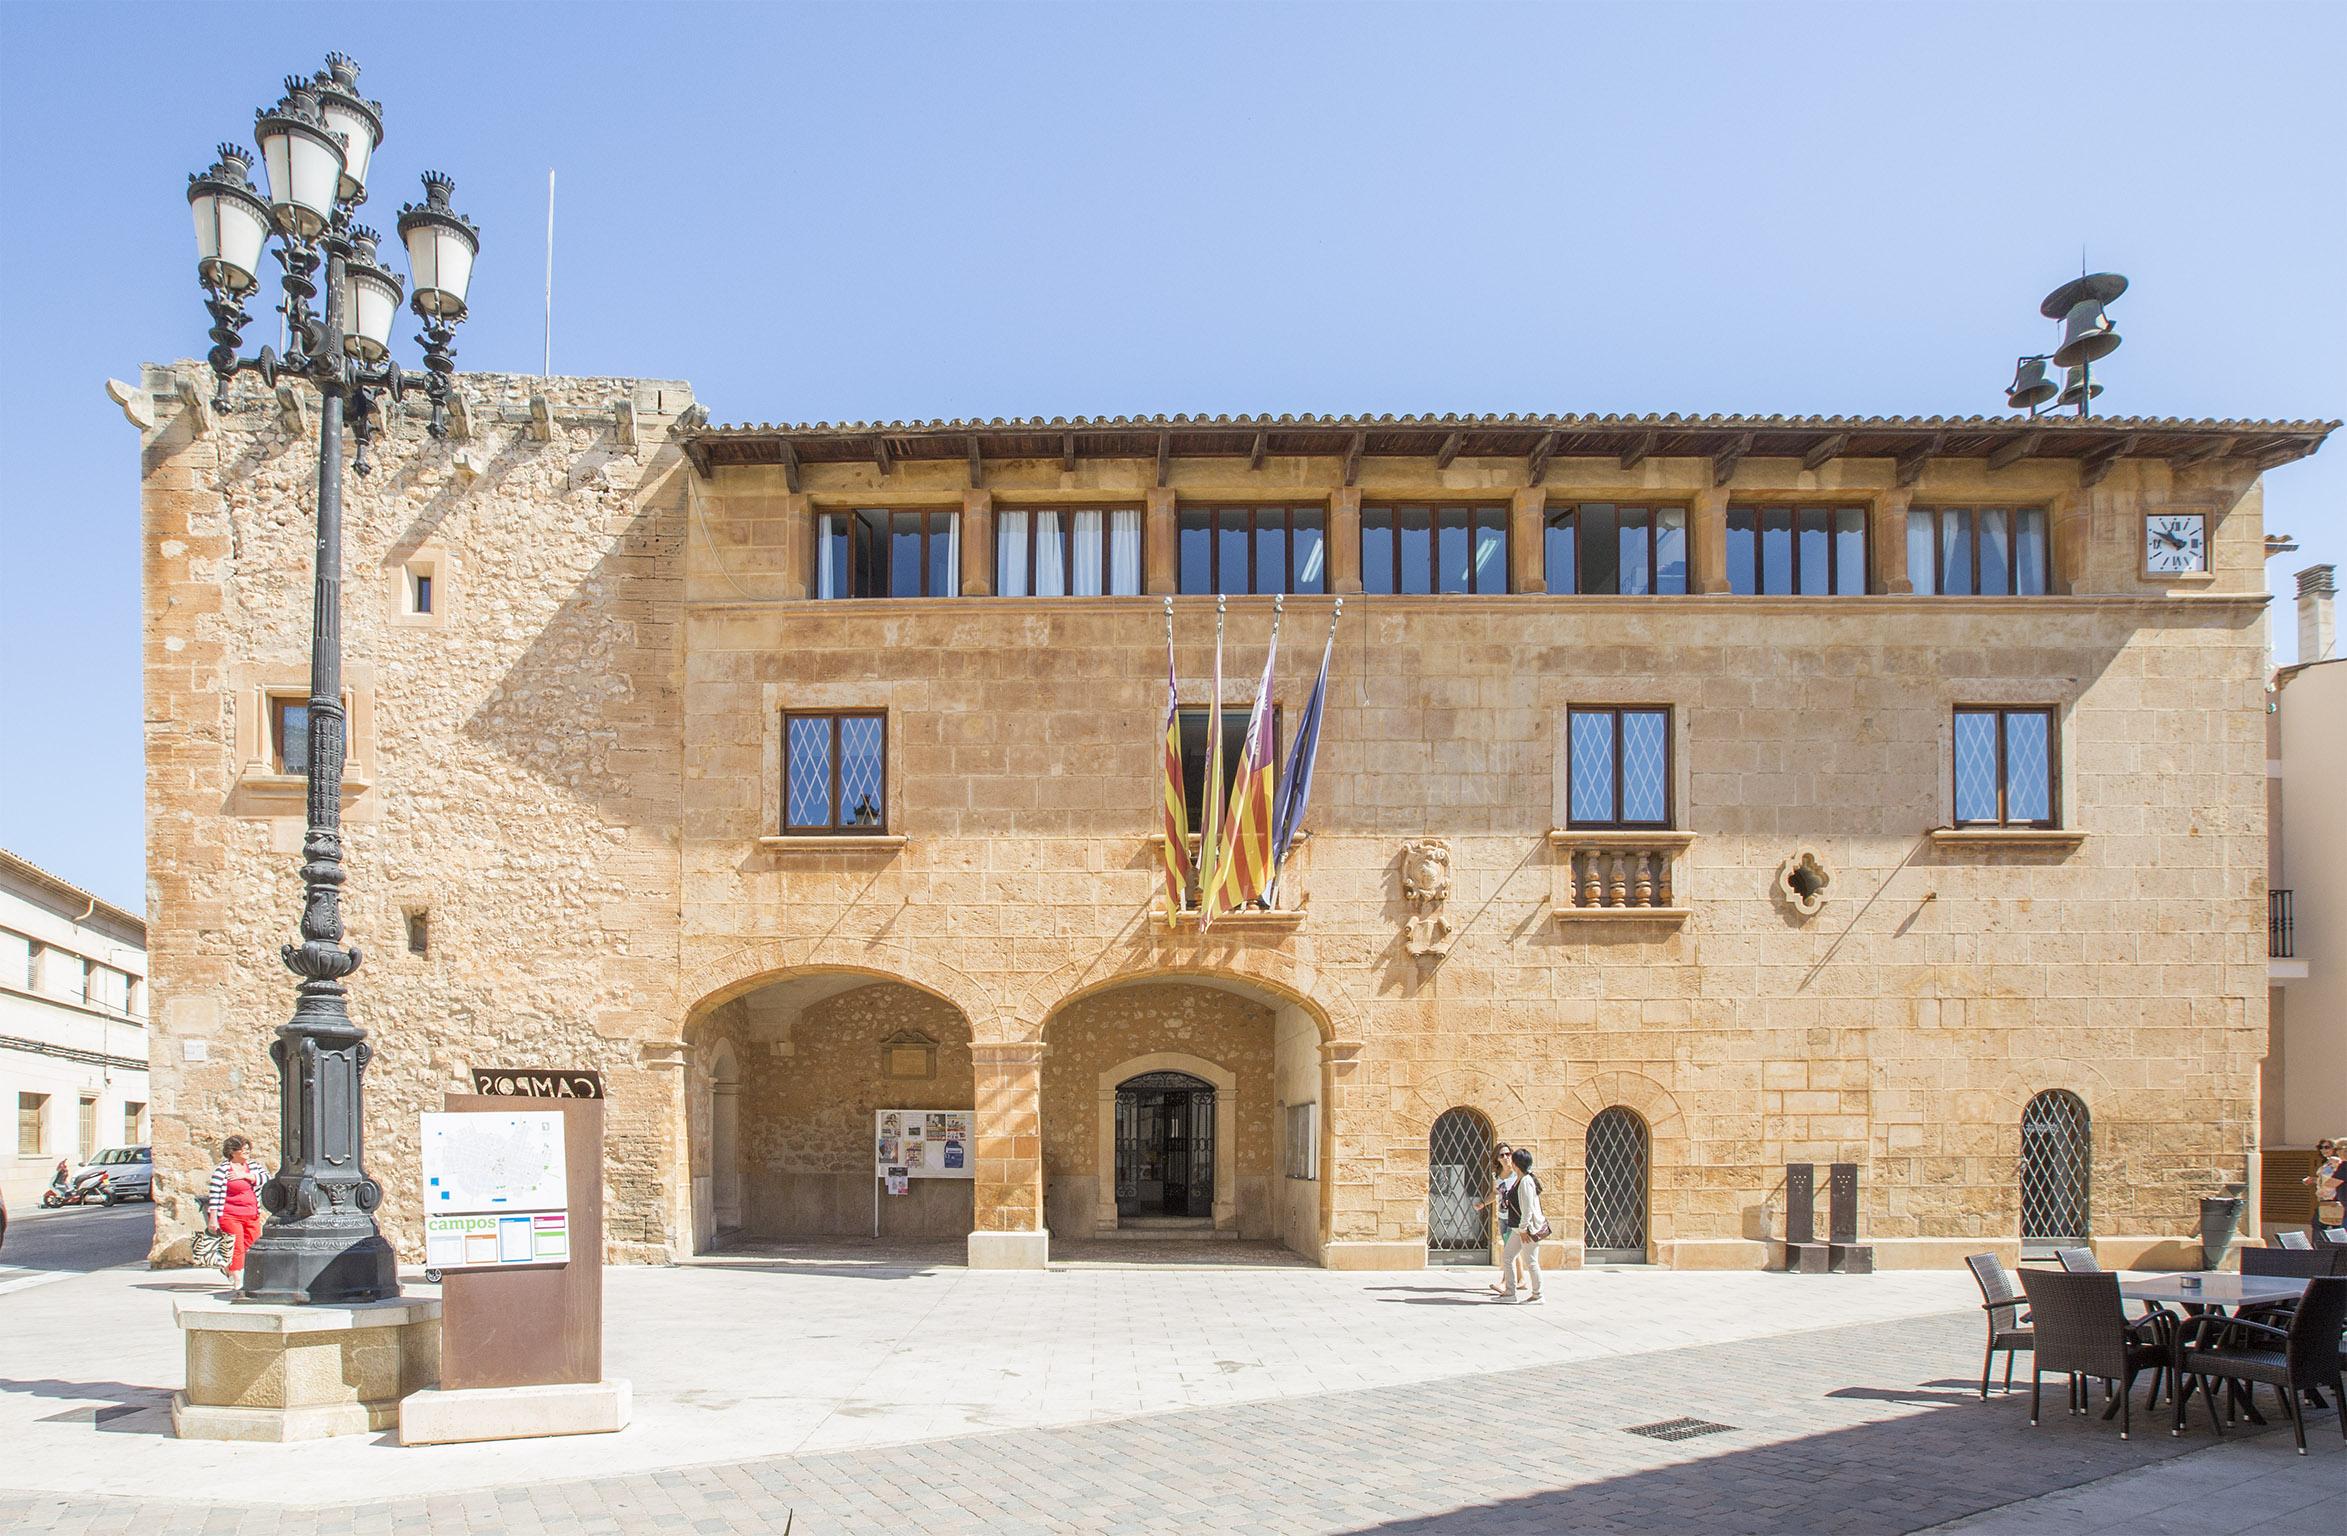 Ferienhaus SANT BLAI VELL (2284789), Campos, Mallorca, Balearische Inseln, Spanien, Bild 25